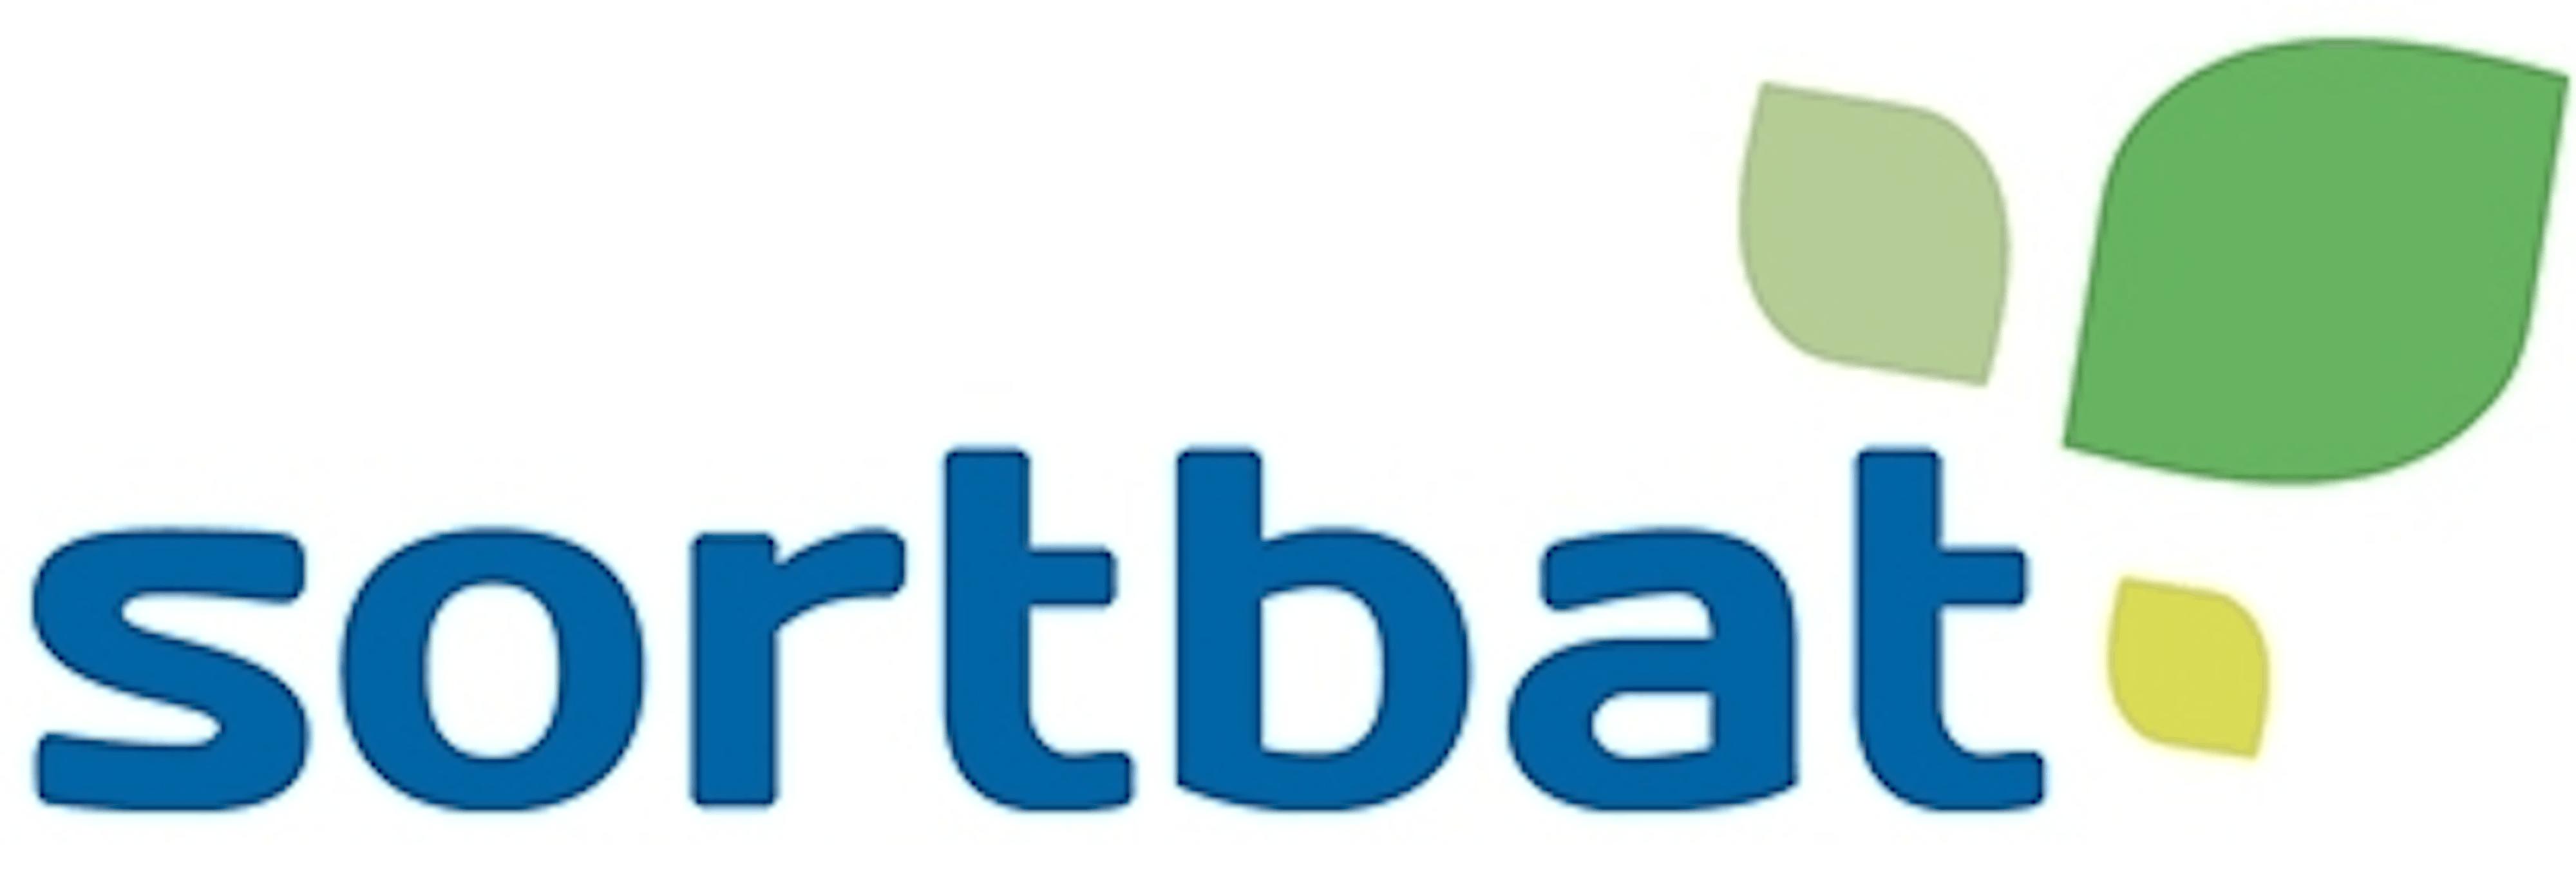 Sortbat logo